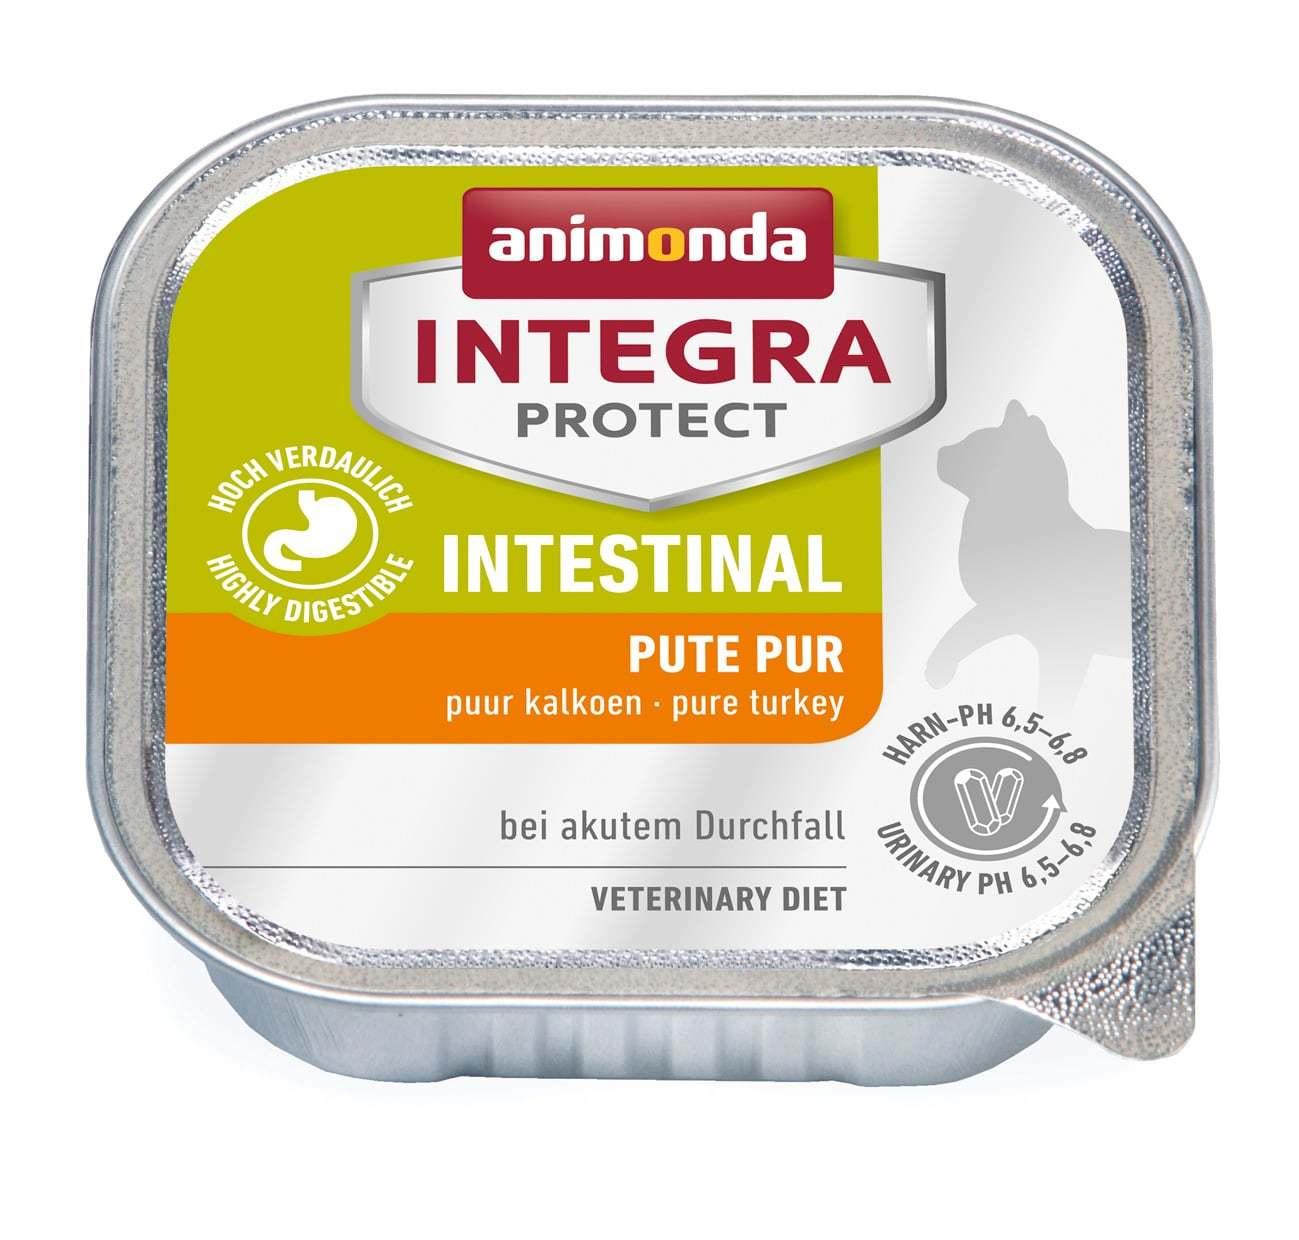 Купить Animonda Integra Protect Cat (ламистер) Intestinal pure Turkey для кошек